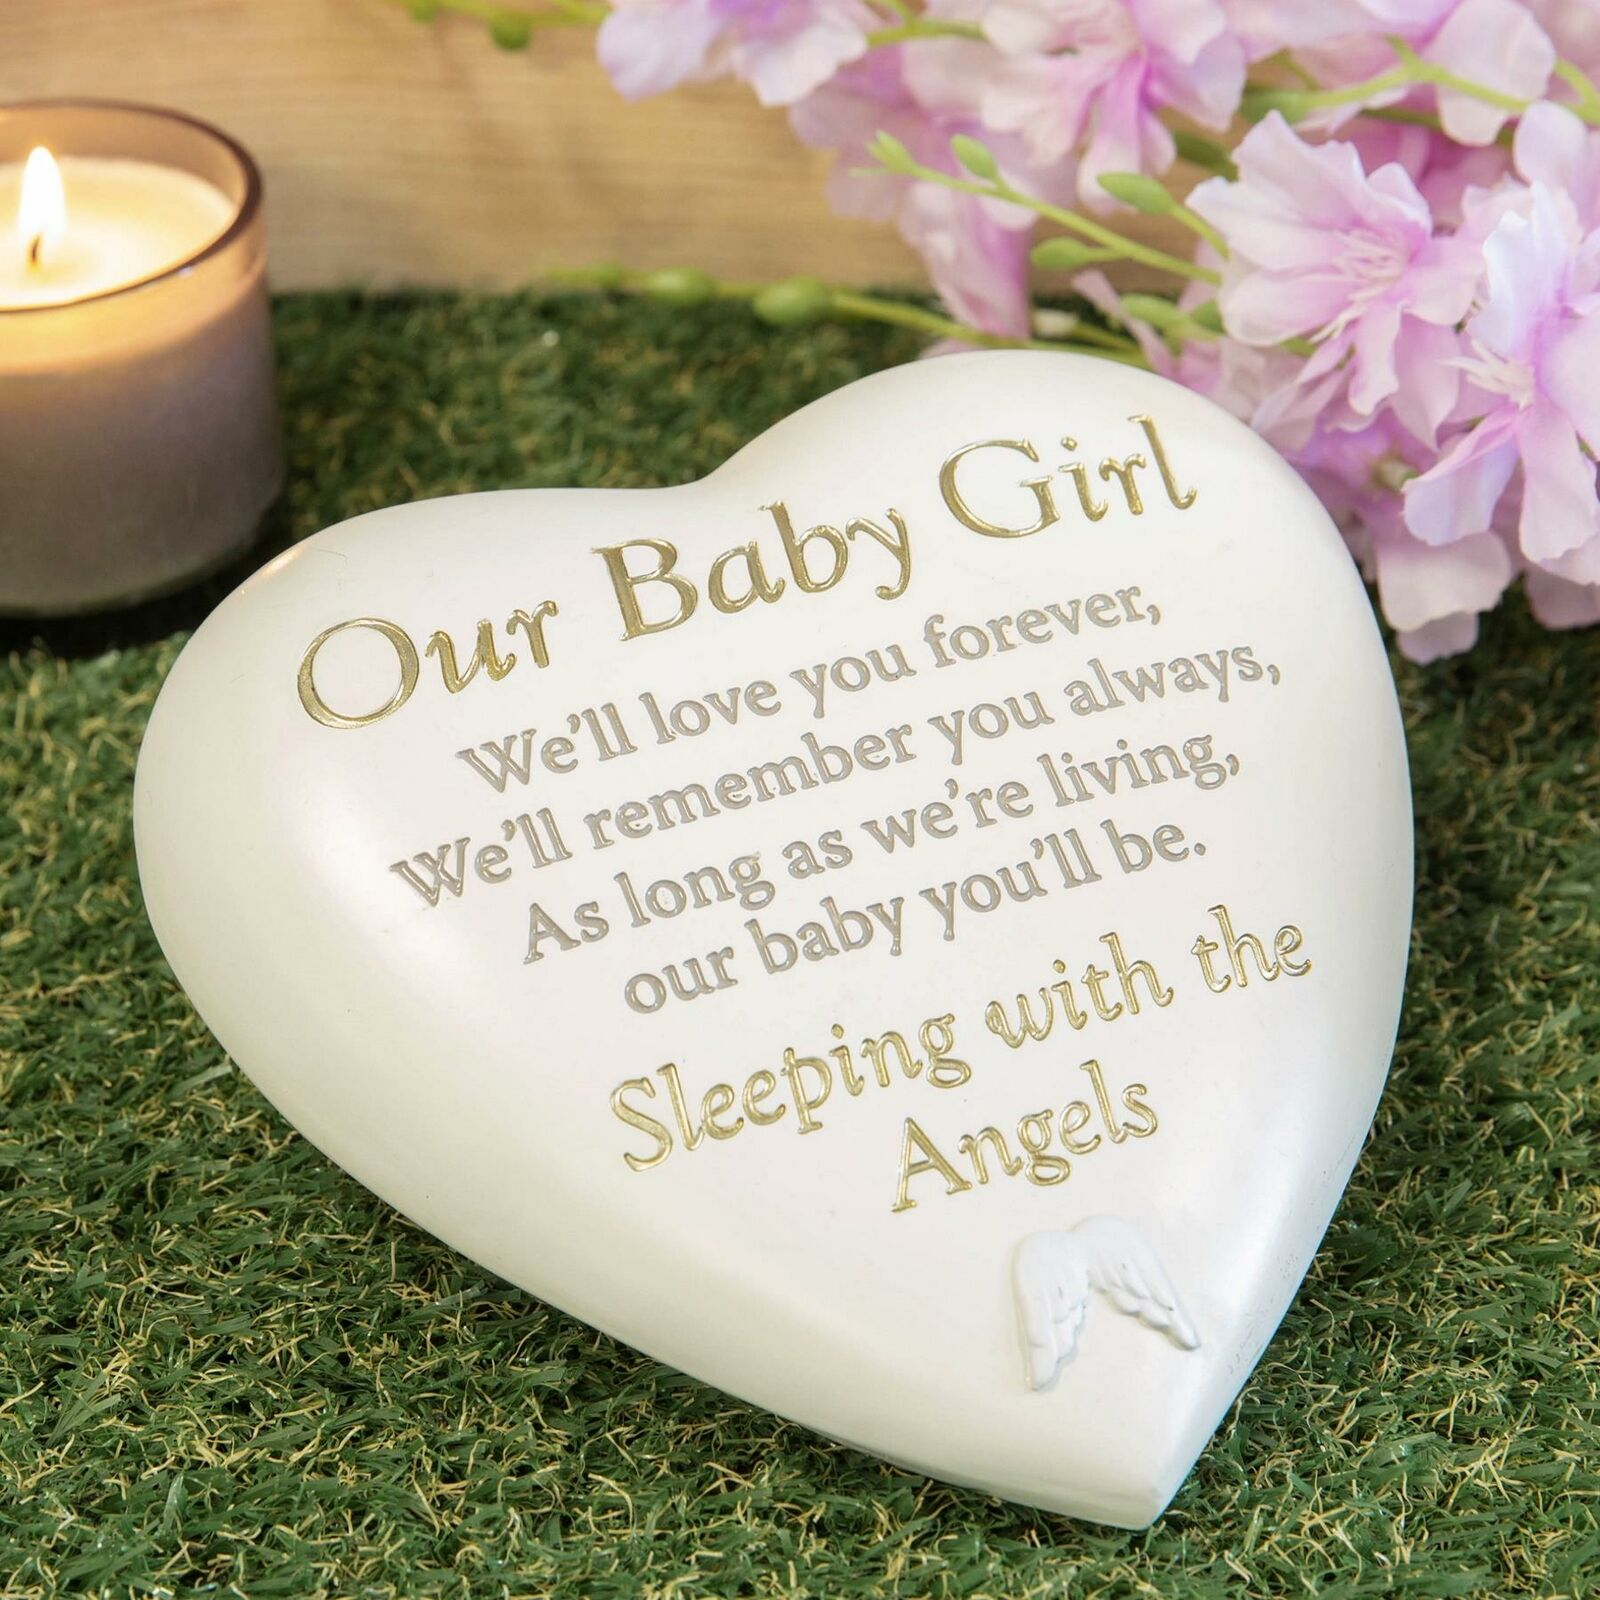 Baby girl heart stone